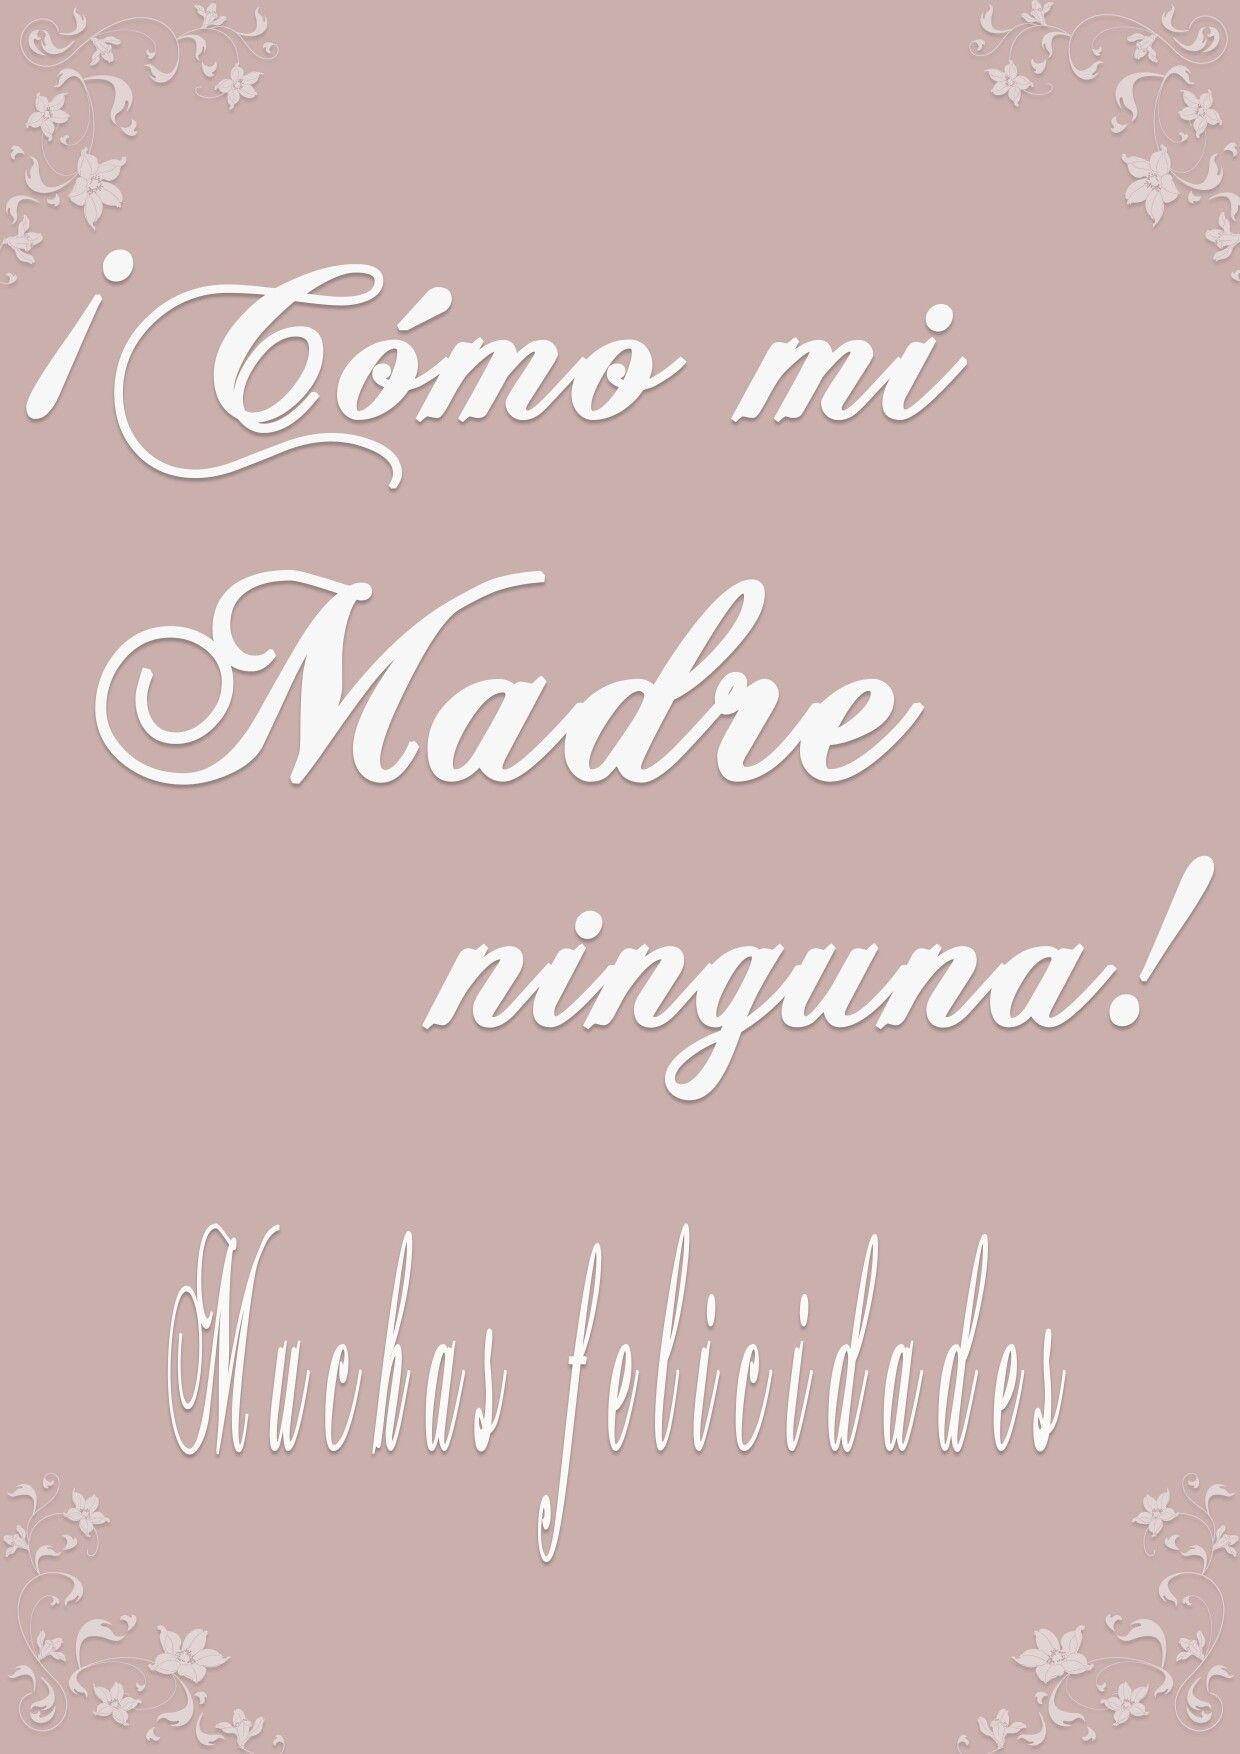 Tarjeta Día de la Madre-mother's day card #diadelamadre, #mother'sday